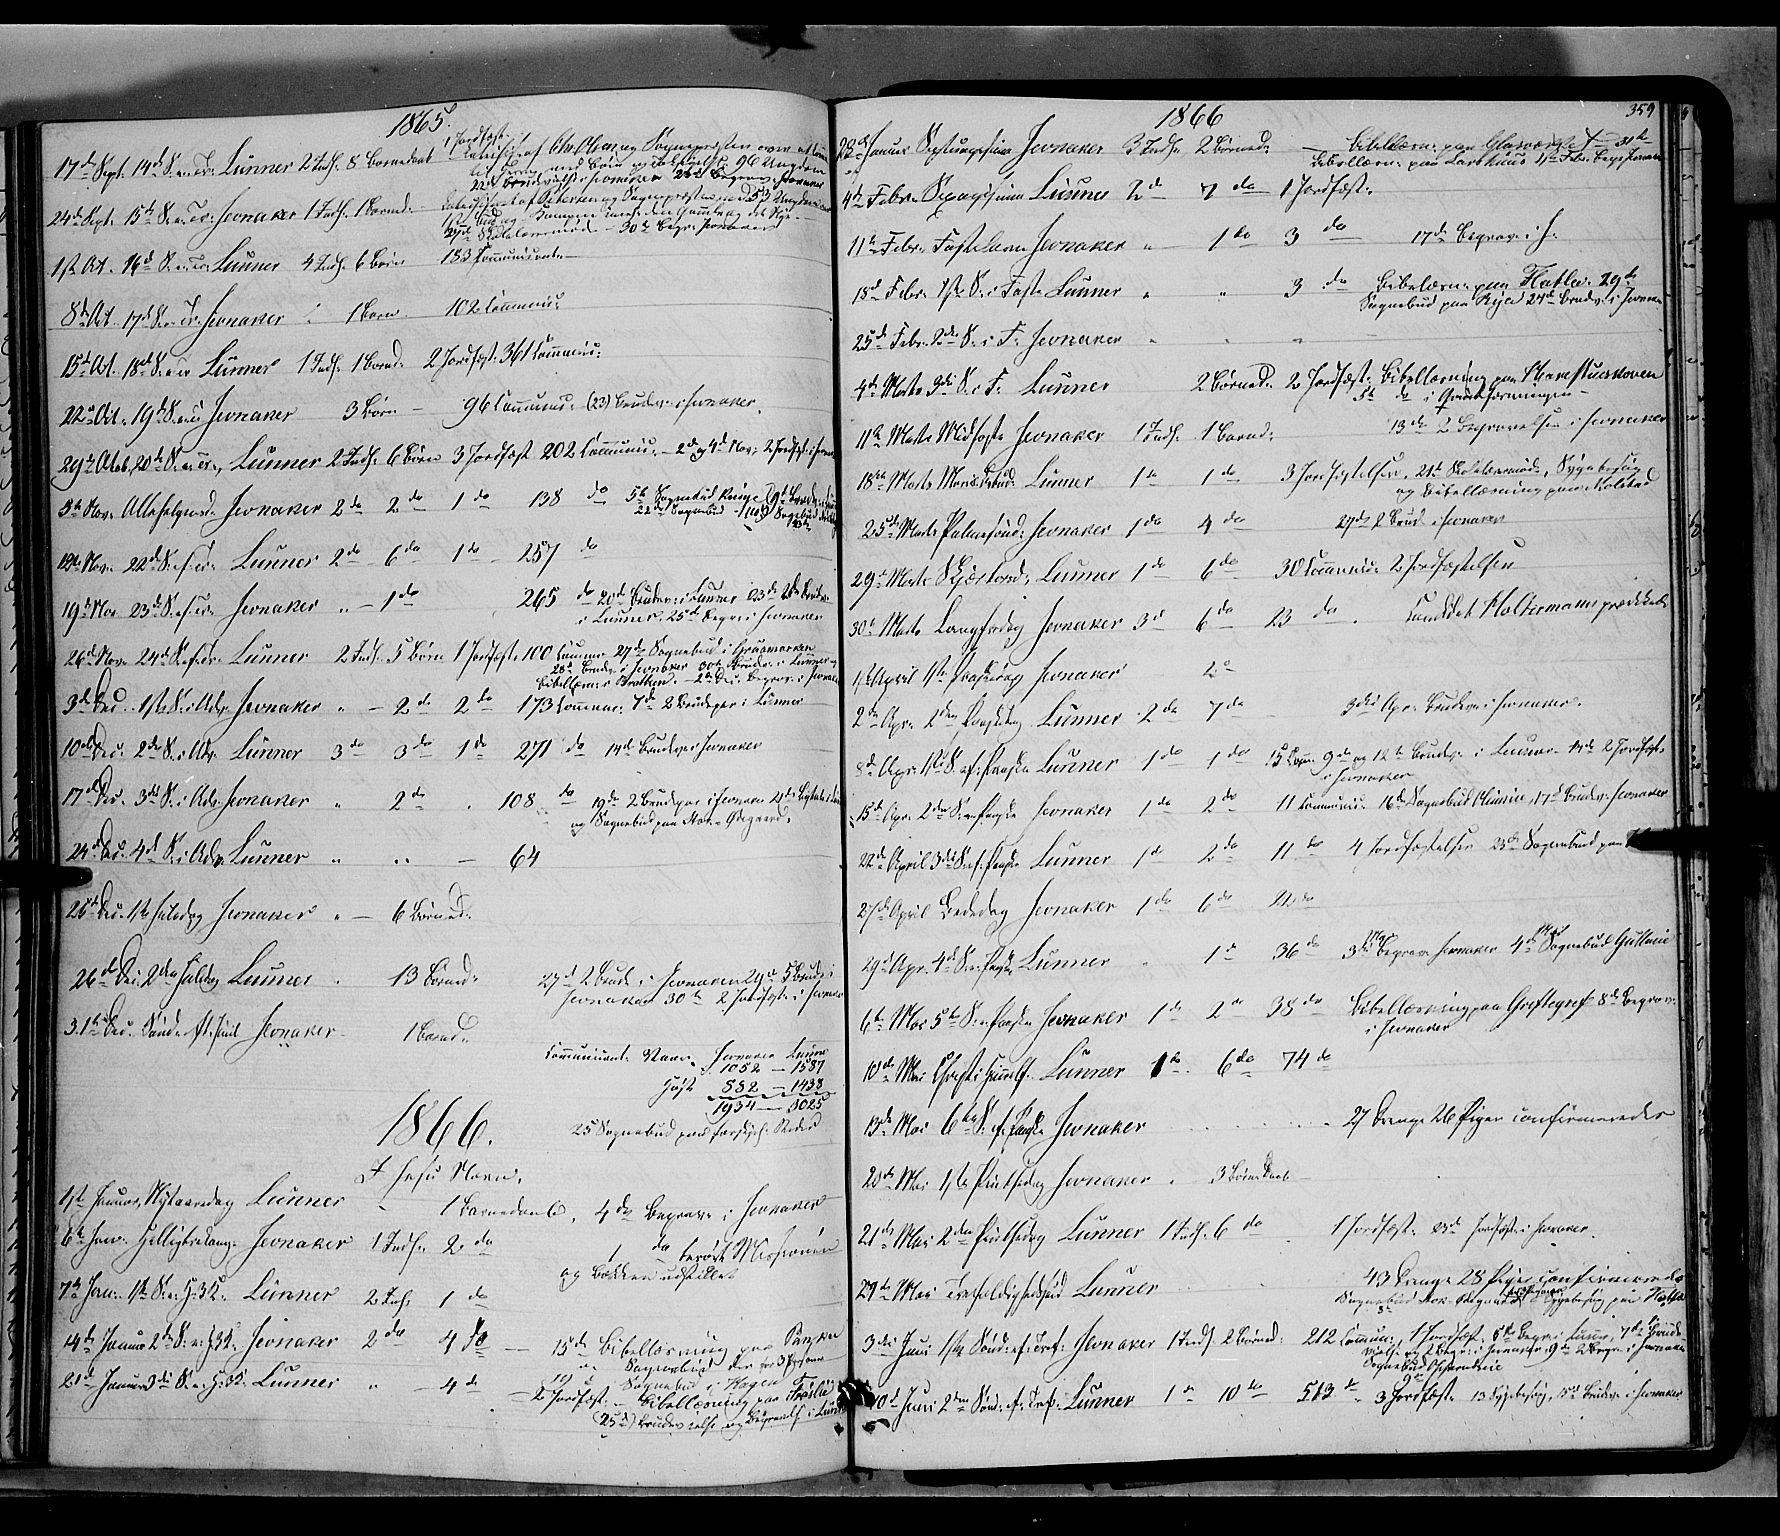 SAH, Jevnaker prestekontor, Ministerialbok nr. 7, 1858-1876, s. 359